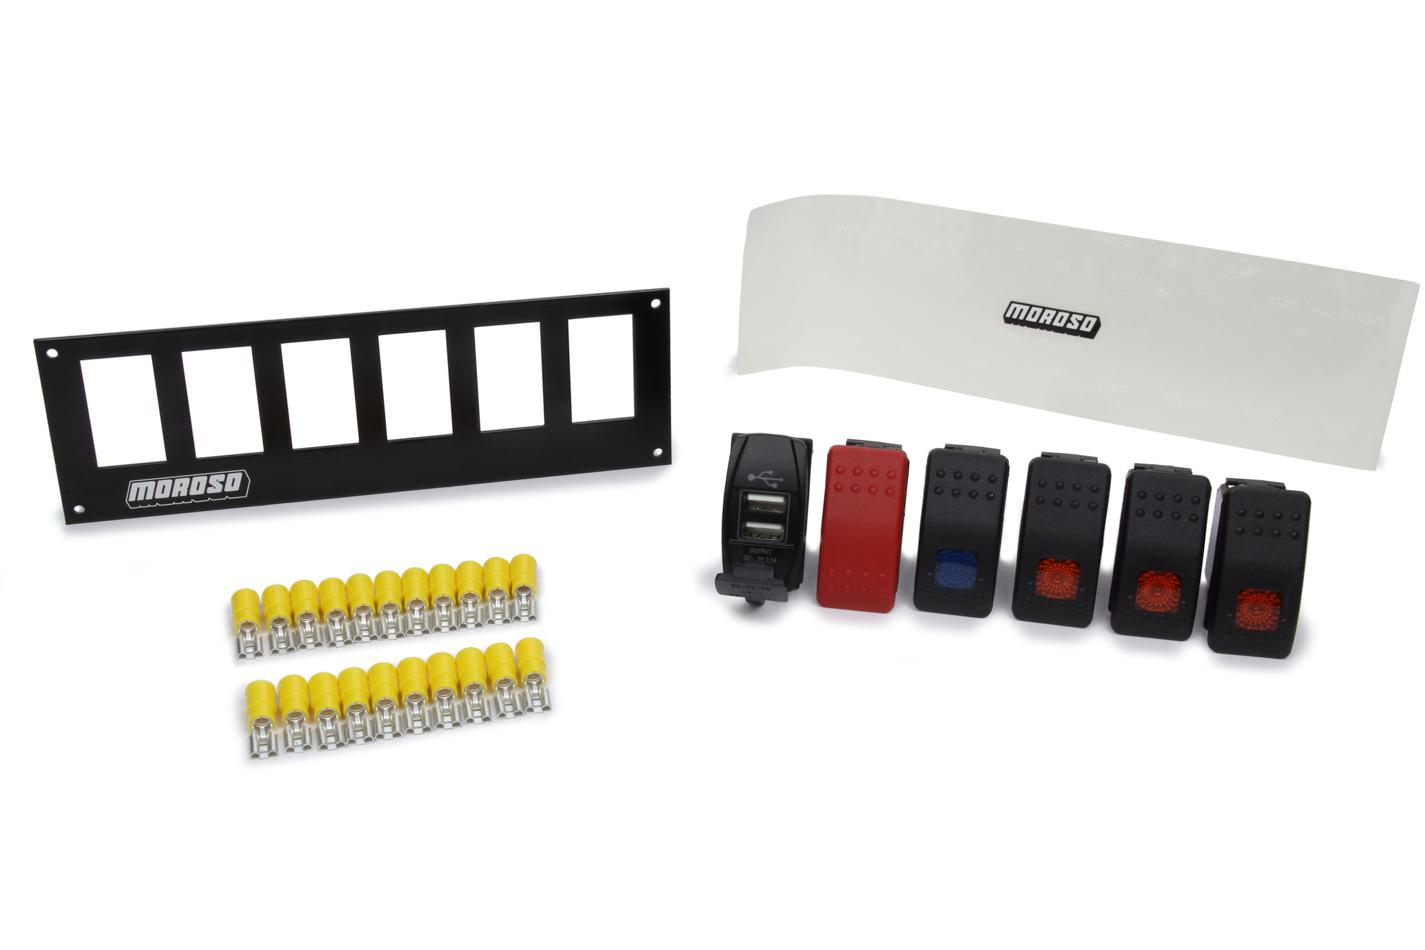 Moroso Rocker LED Switch Panel w/USB Ports